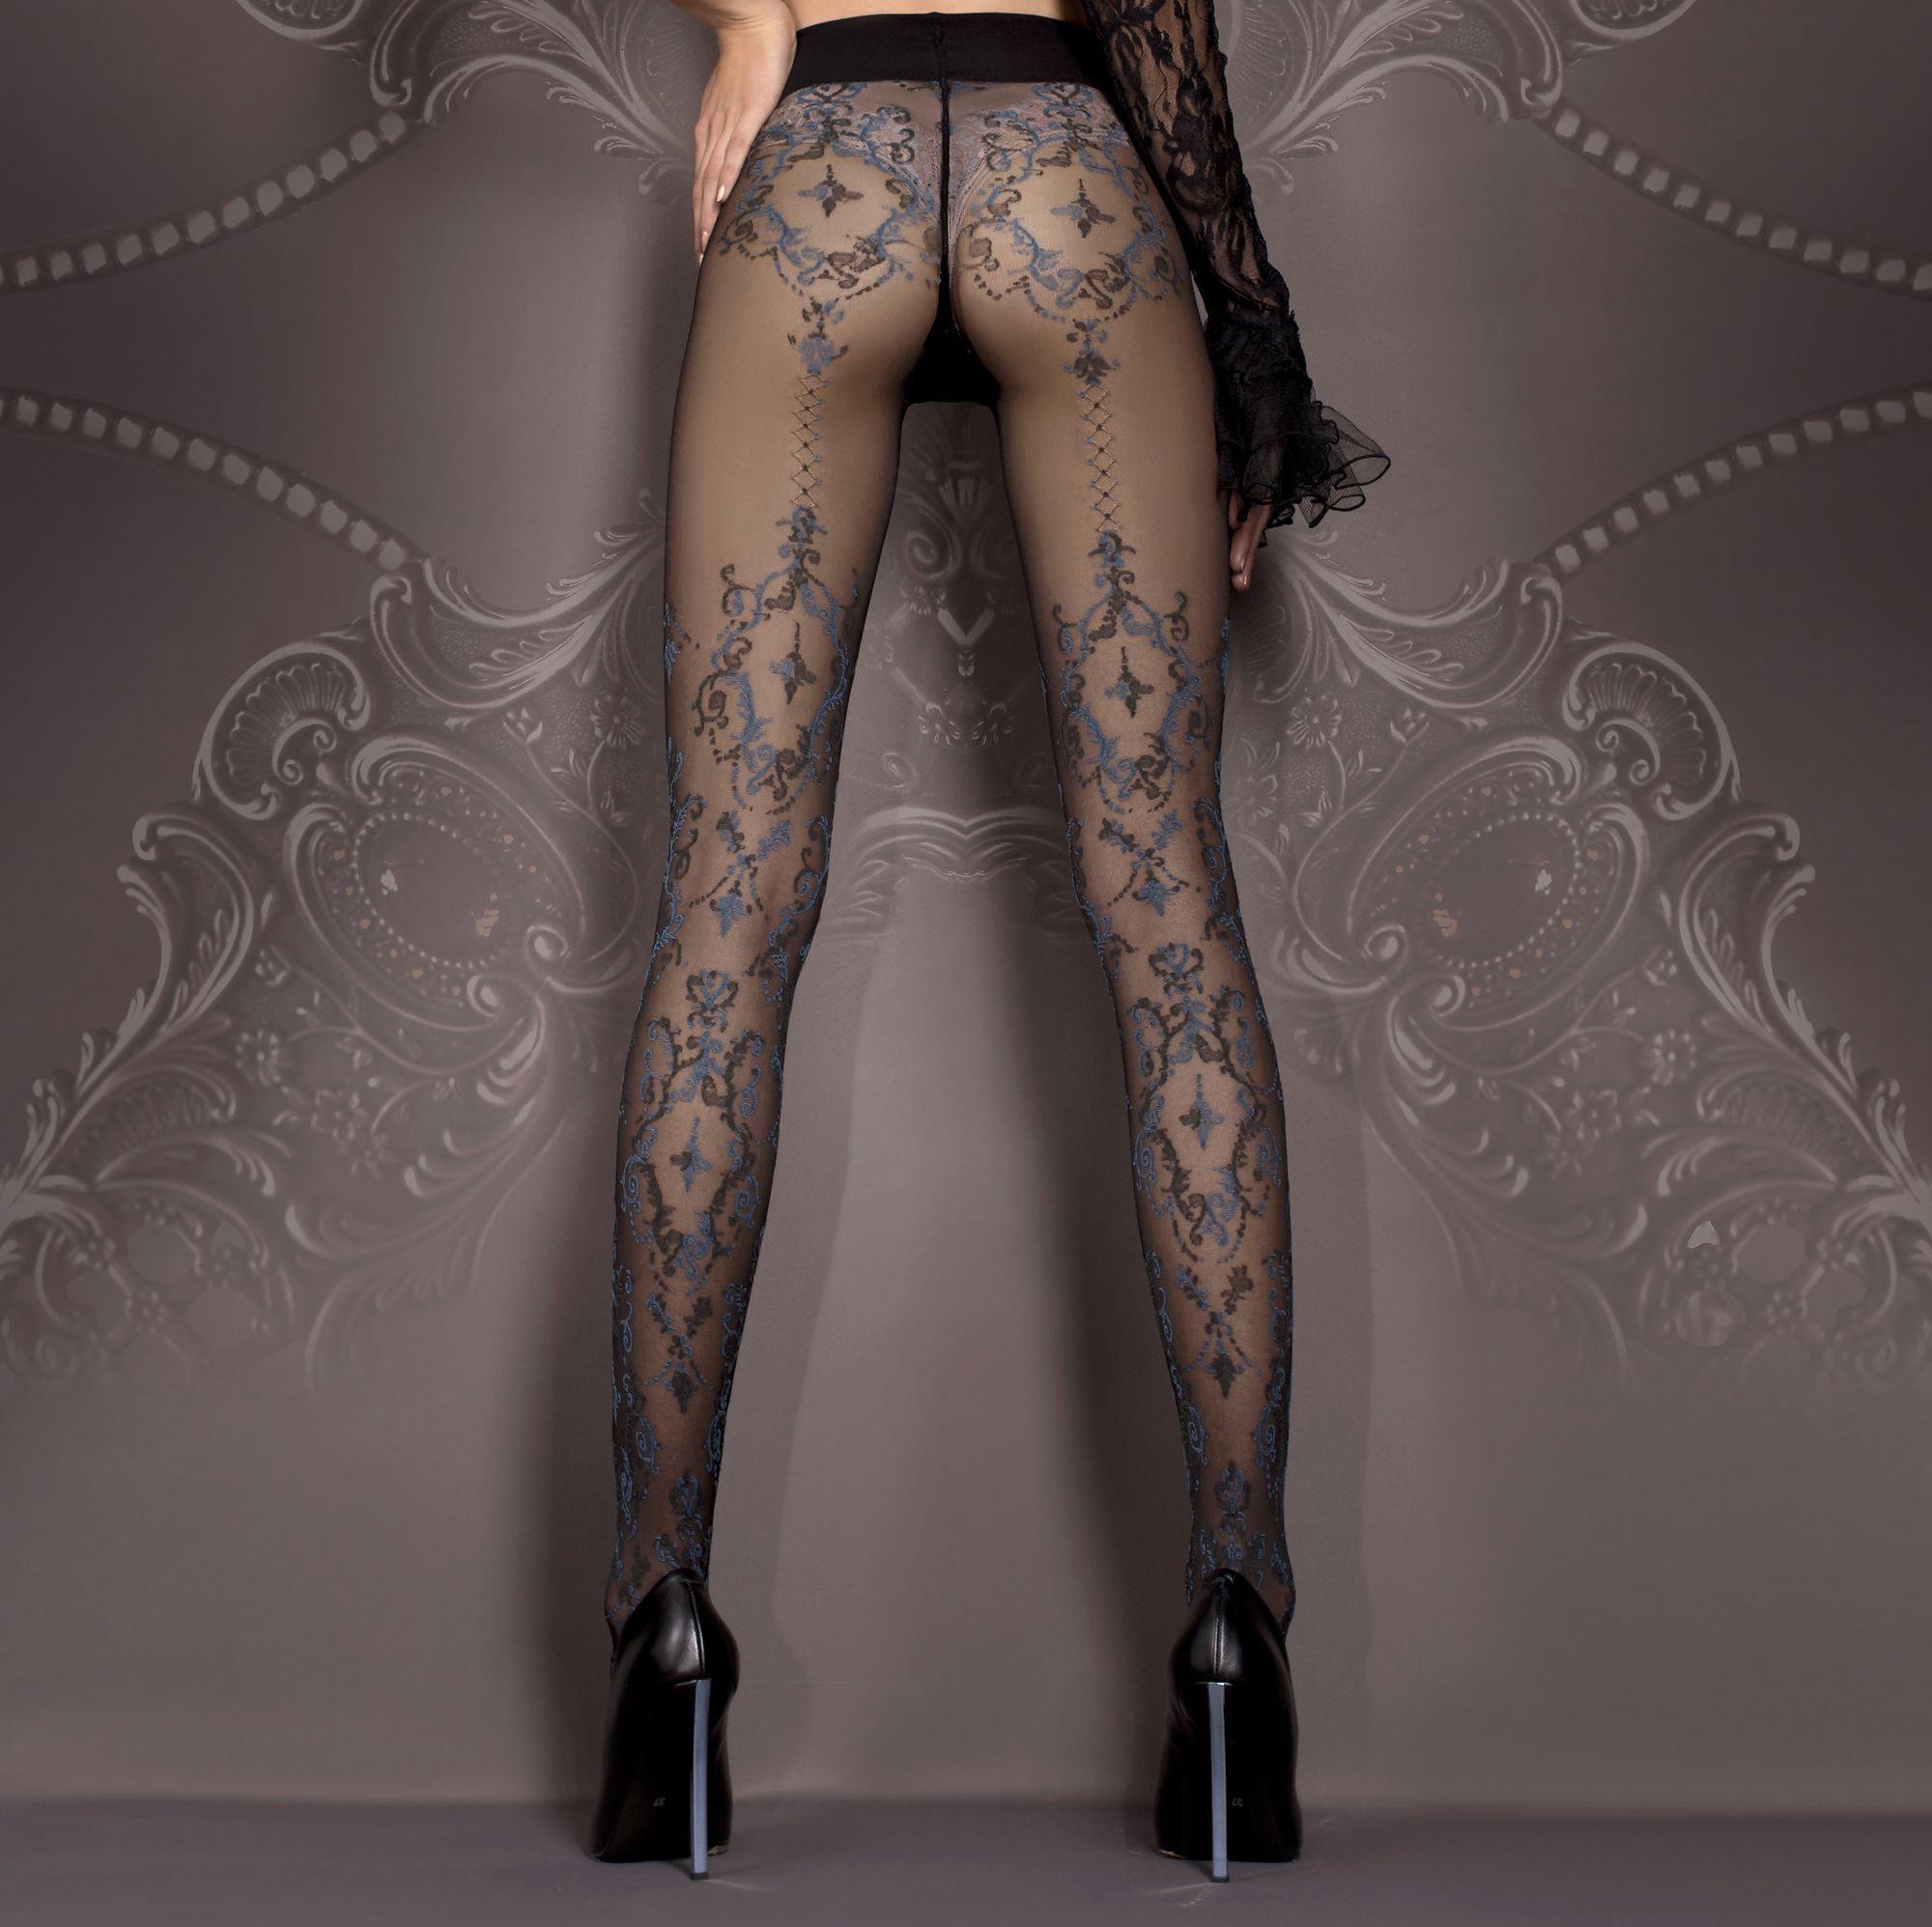 bl412bb_collants-glamour-romantique-pin-up-sexy-sensuelle-arabesques